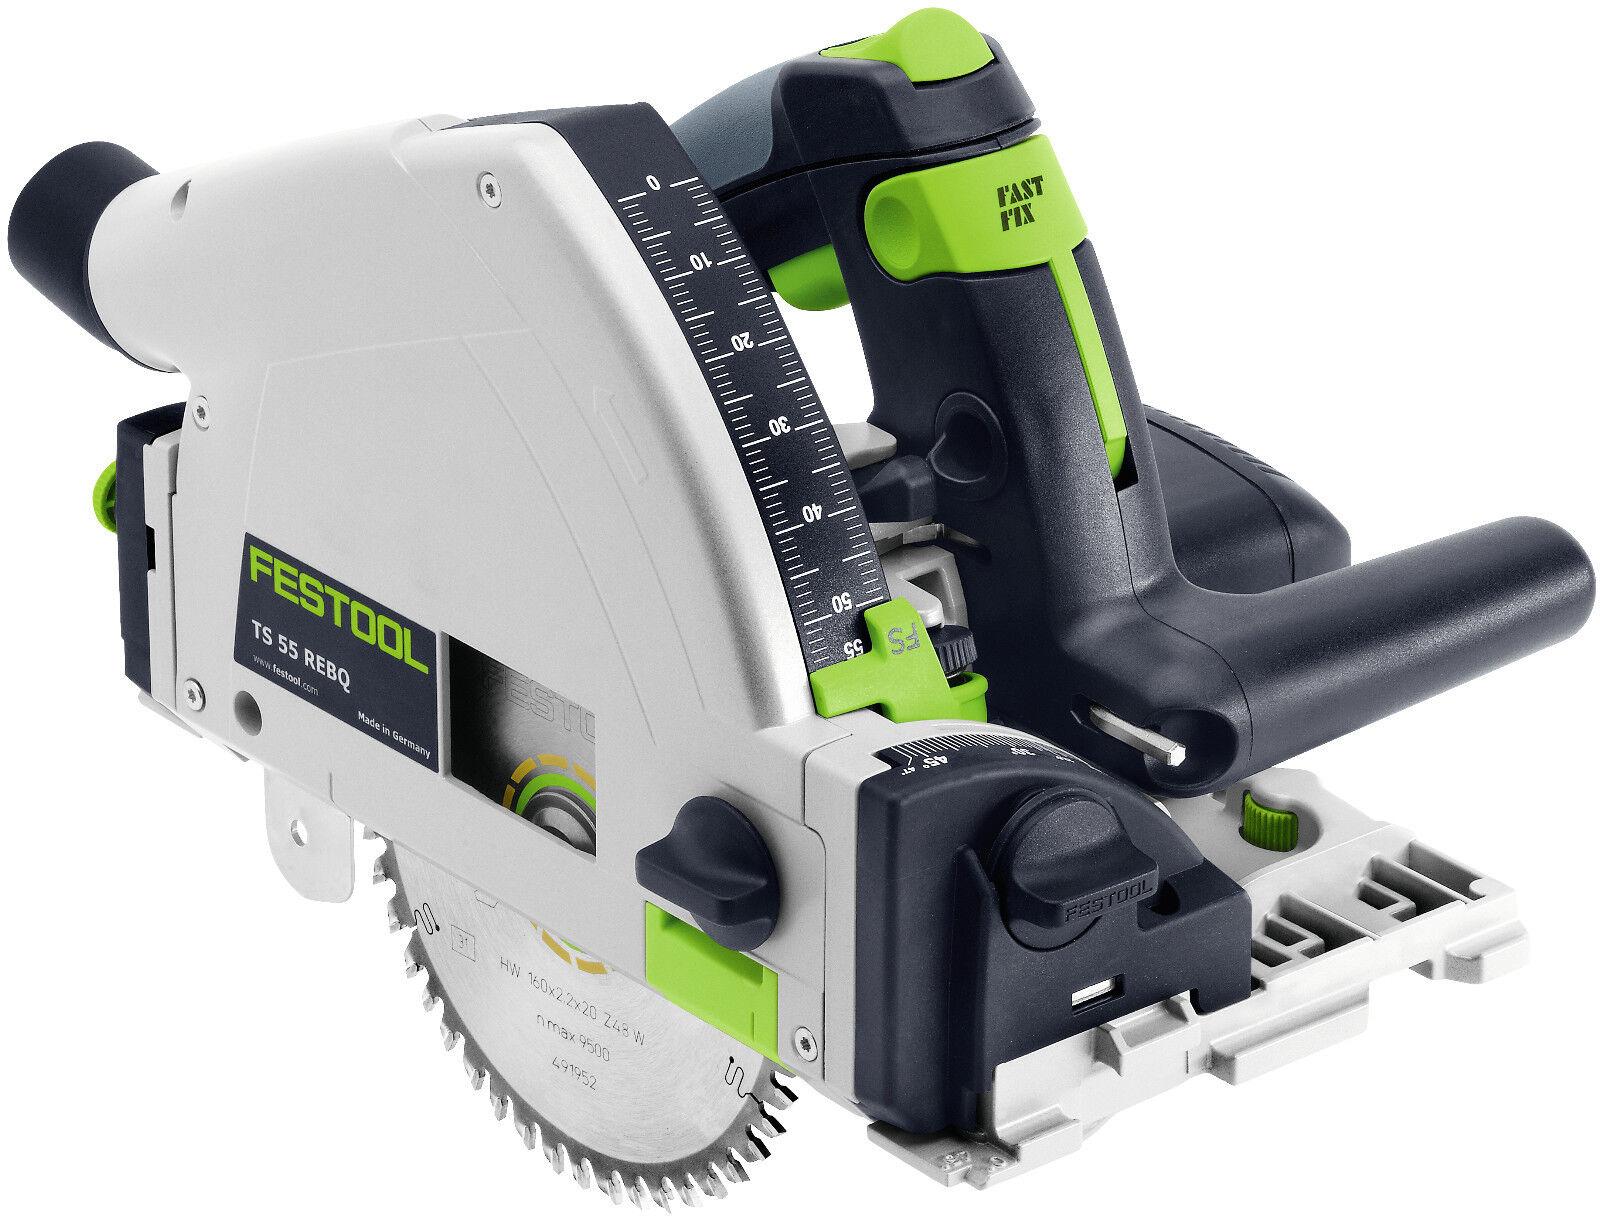 TS 55 REBQ -Plus   Handkreissäge Festool 561551 Systainer neues Modell 11/2018